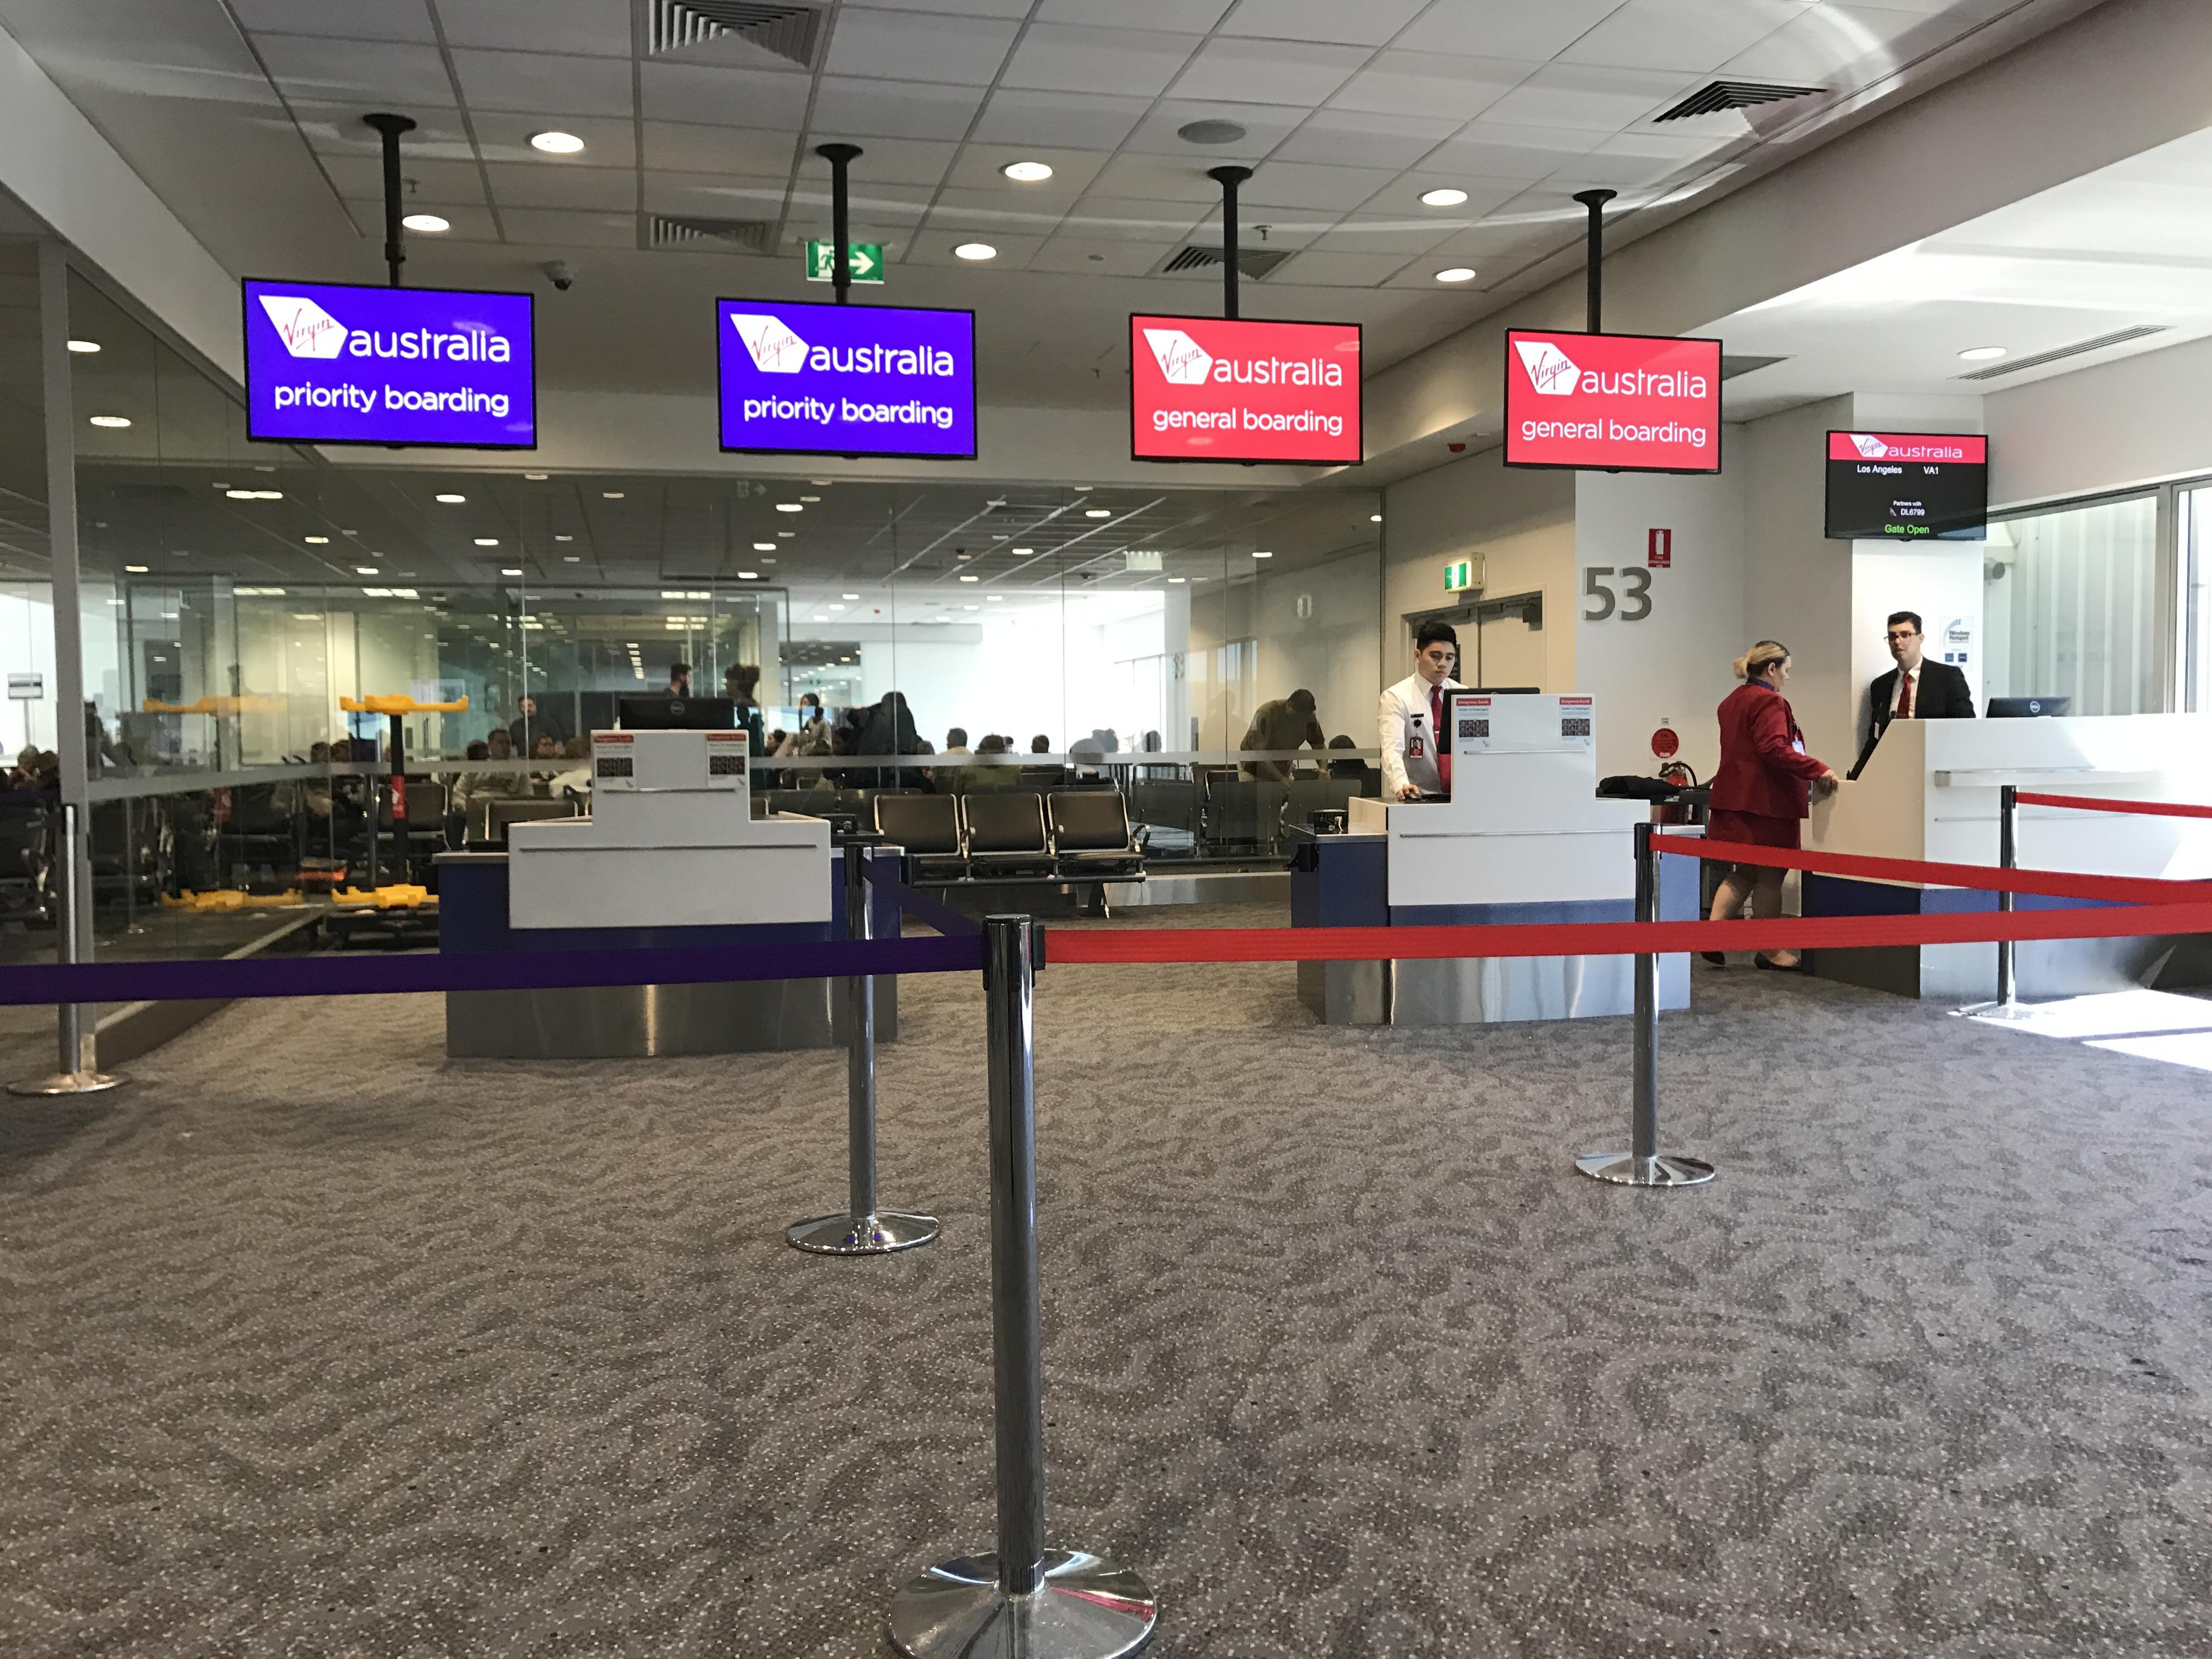 Virgin Australia Boarding Gate 53